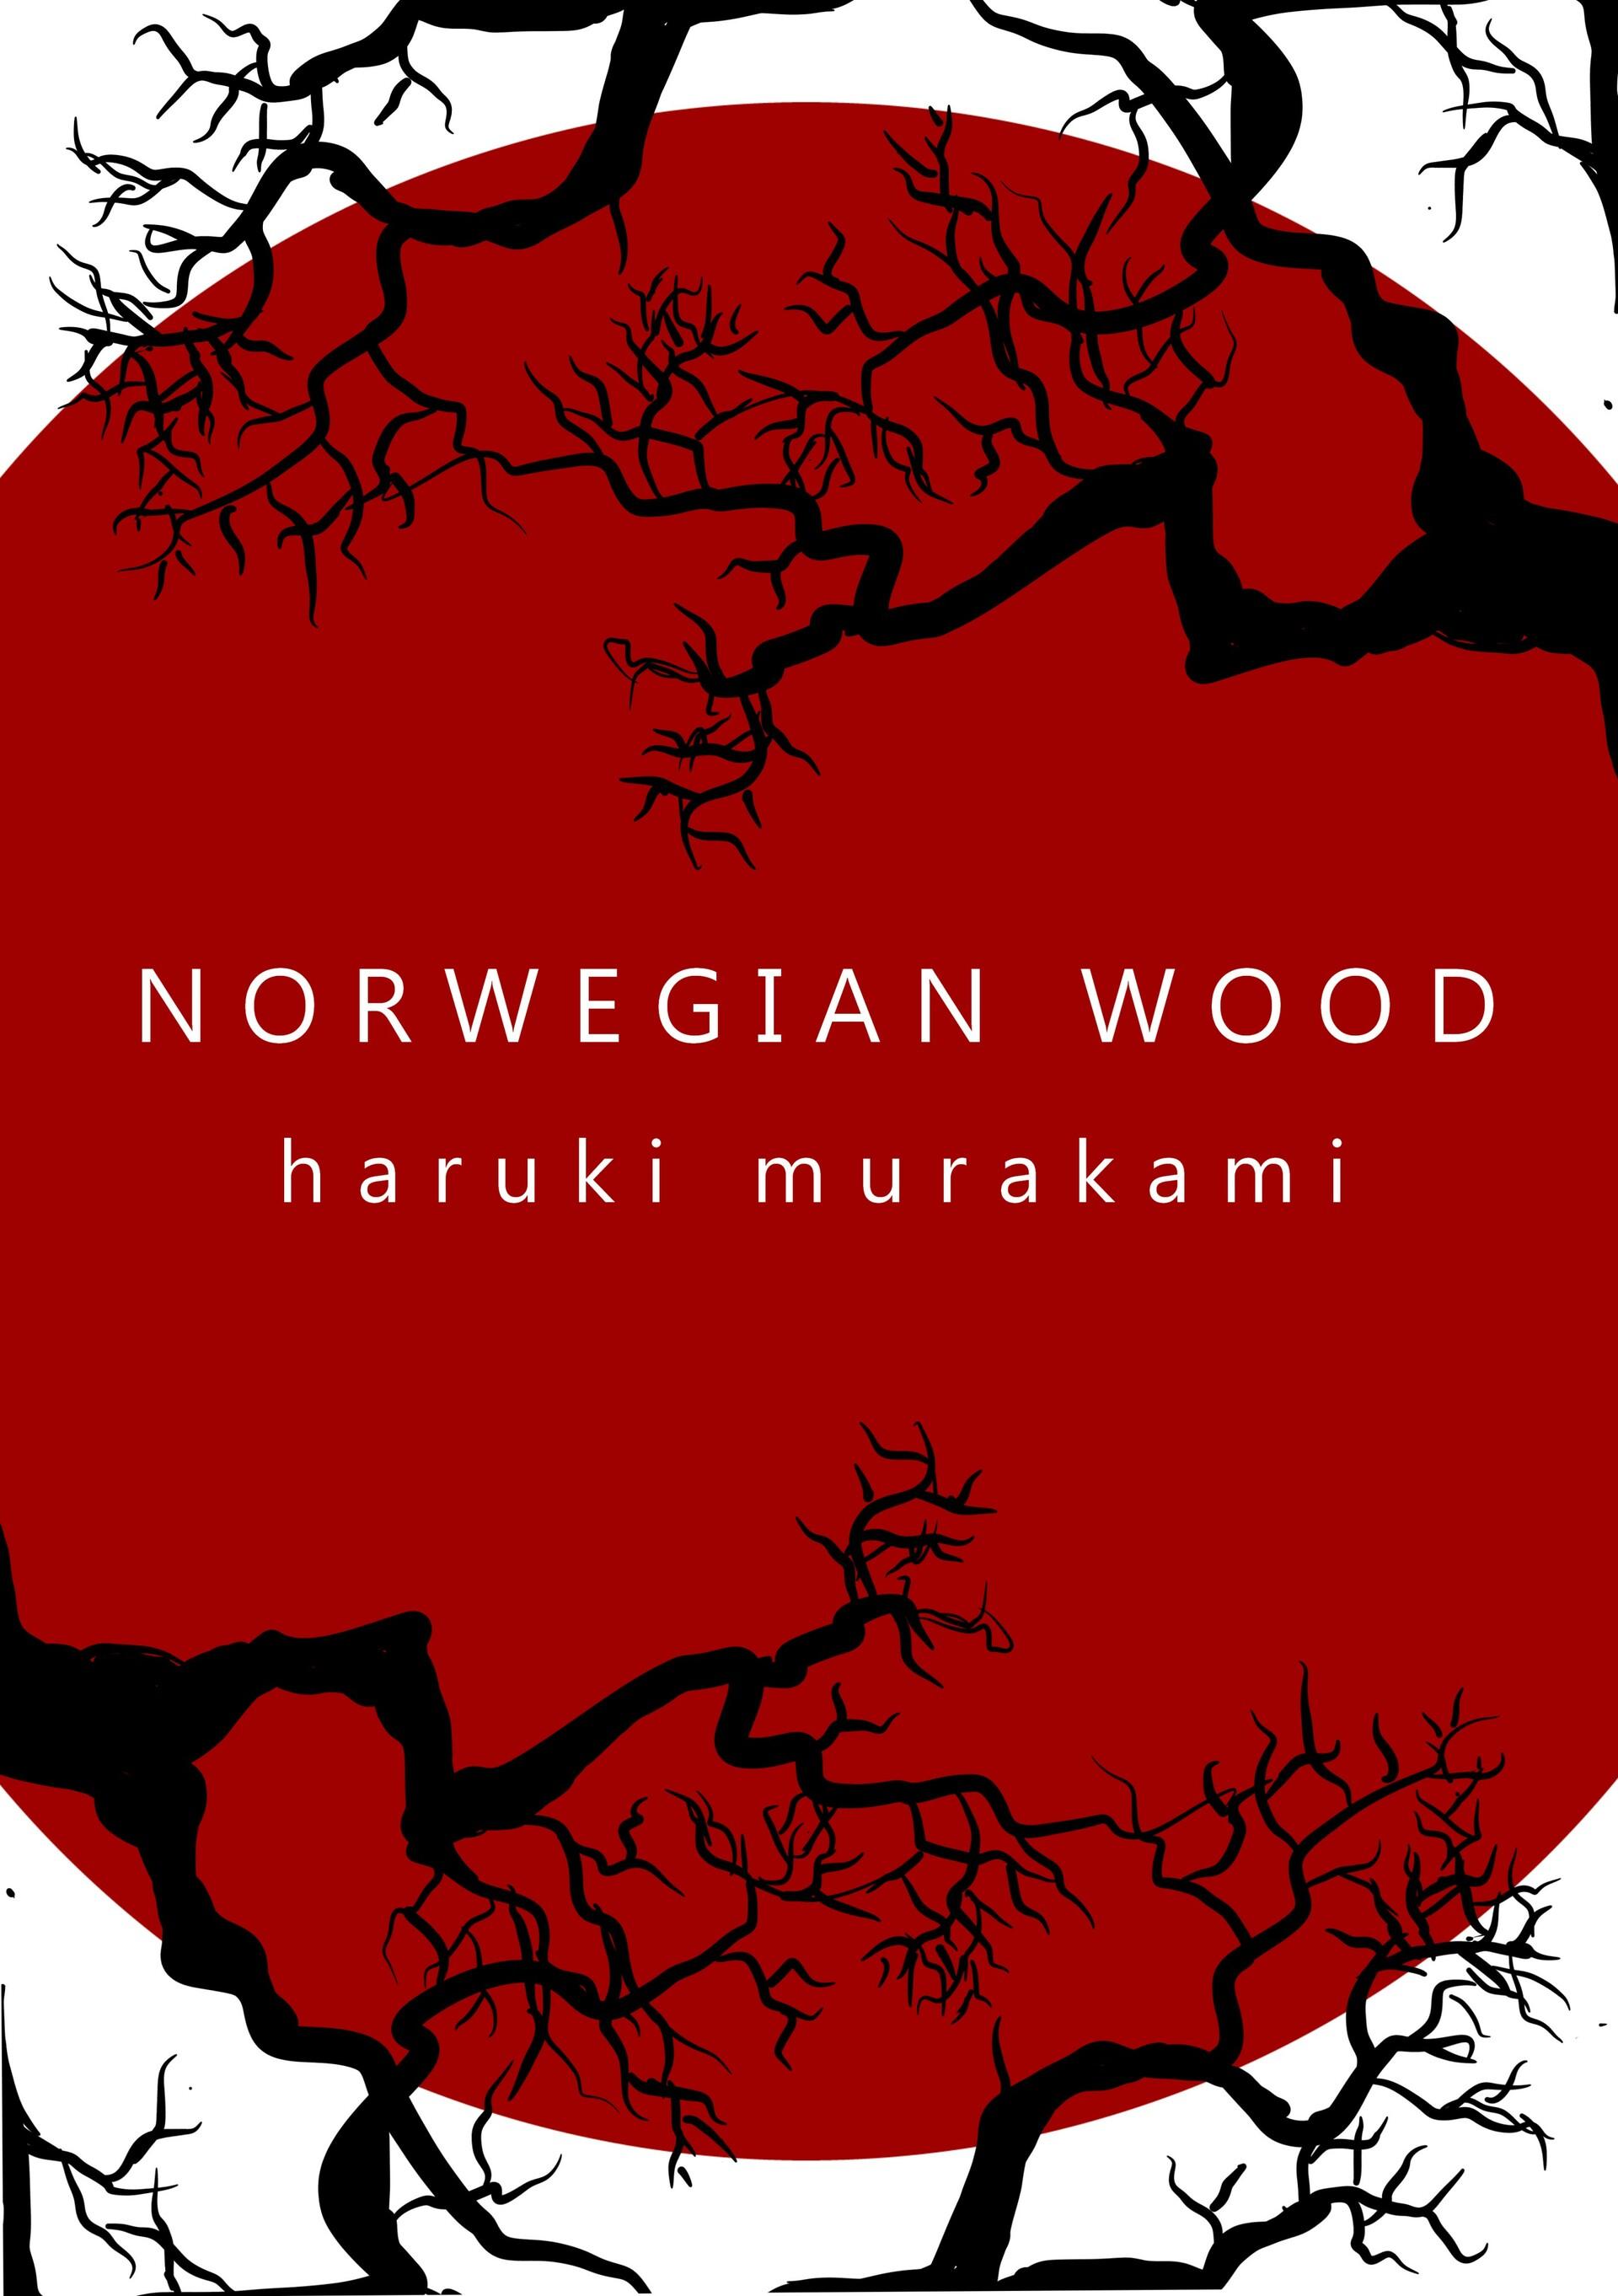 ArtStation - Norwegian Wood-front cover, Megan Strong